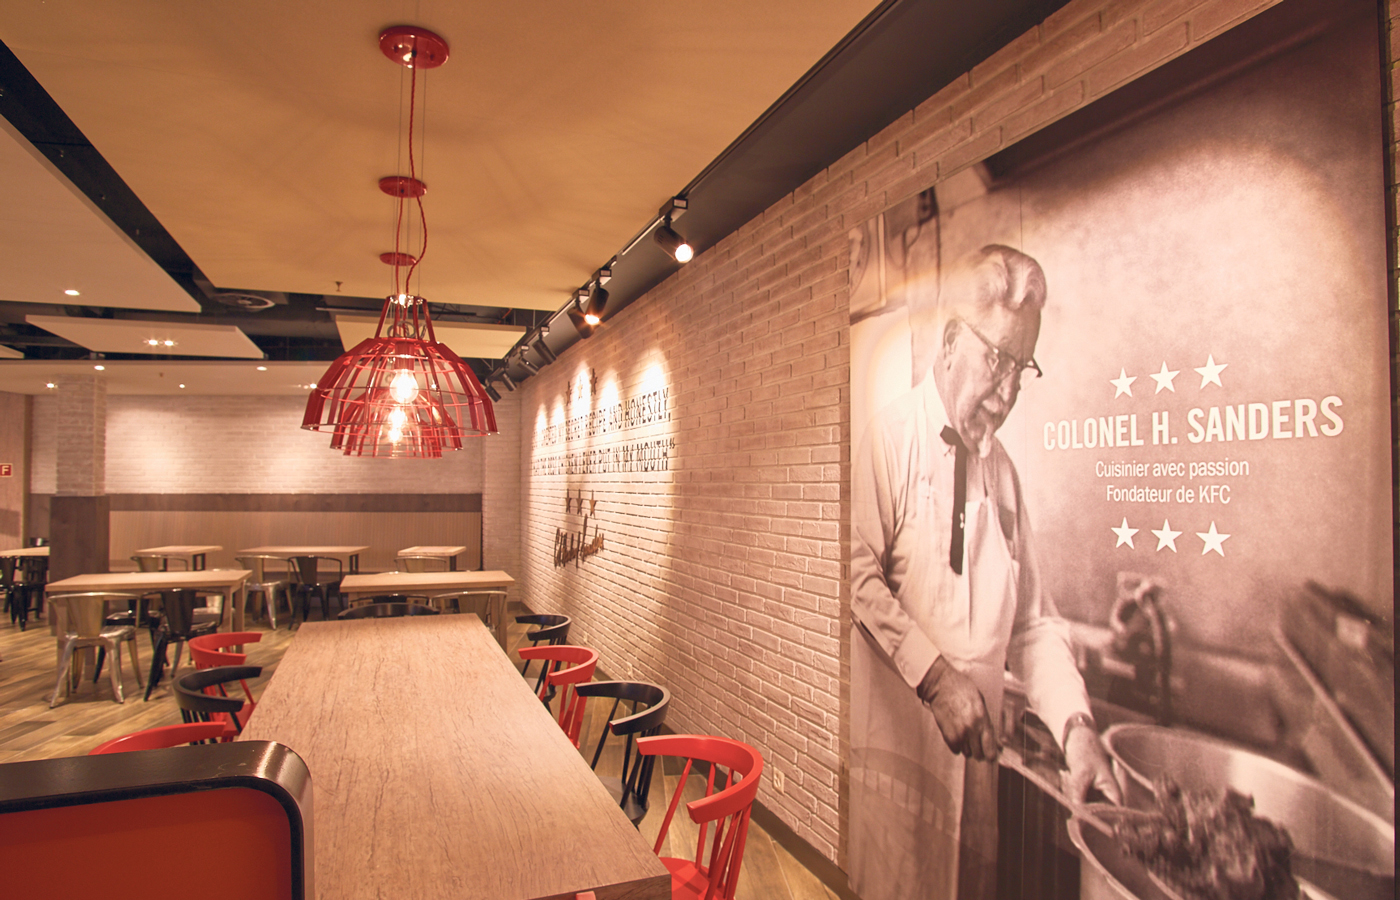 KFC-Ebikon-bietet-viele-M-glichkeiten-